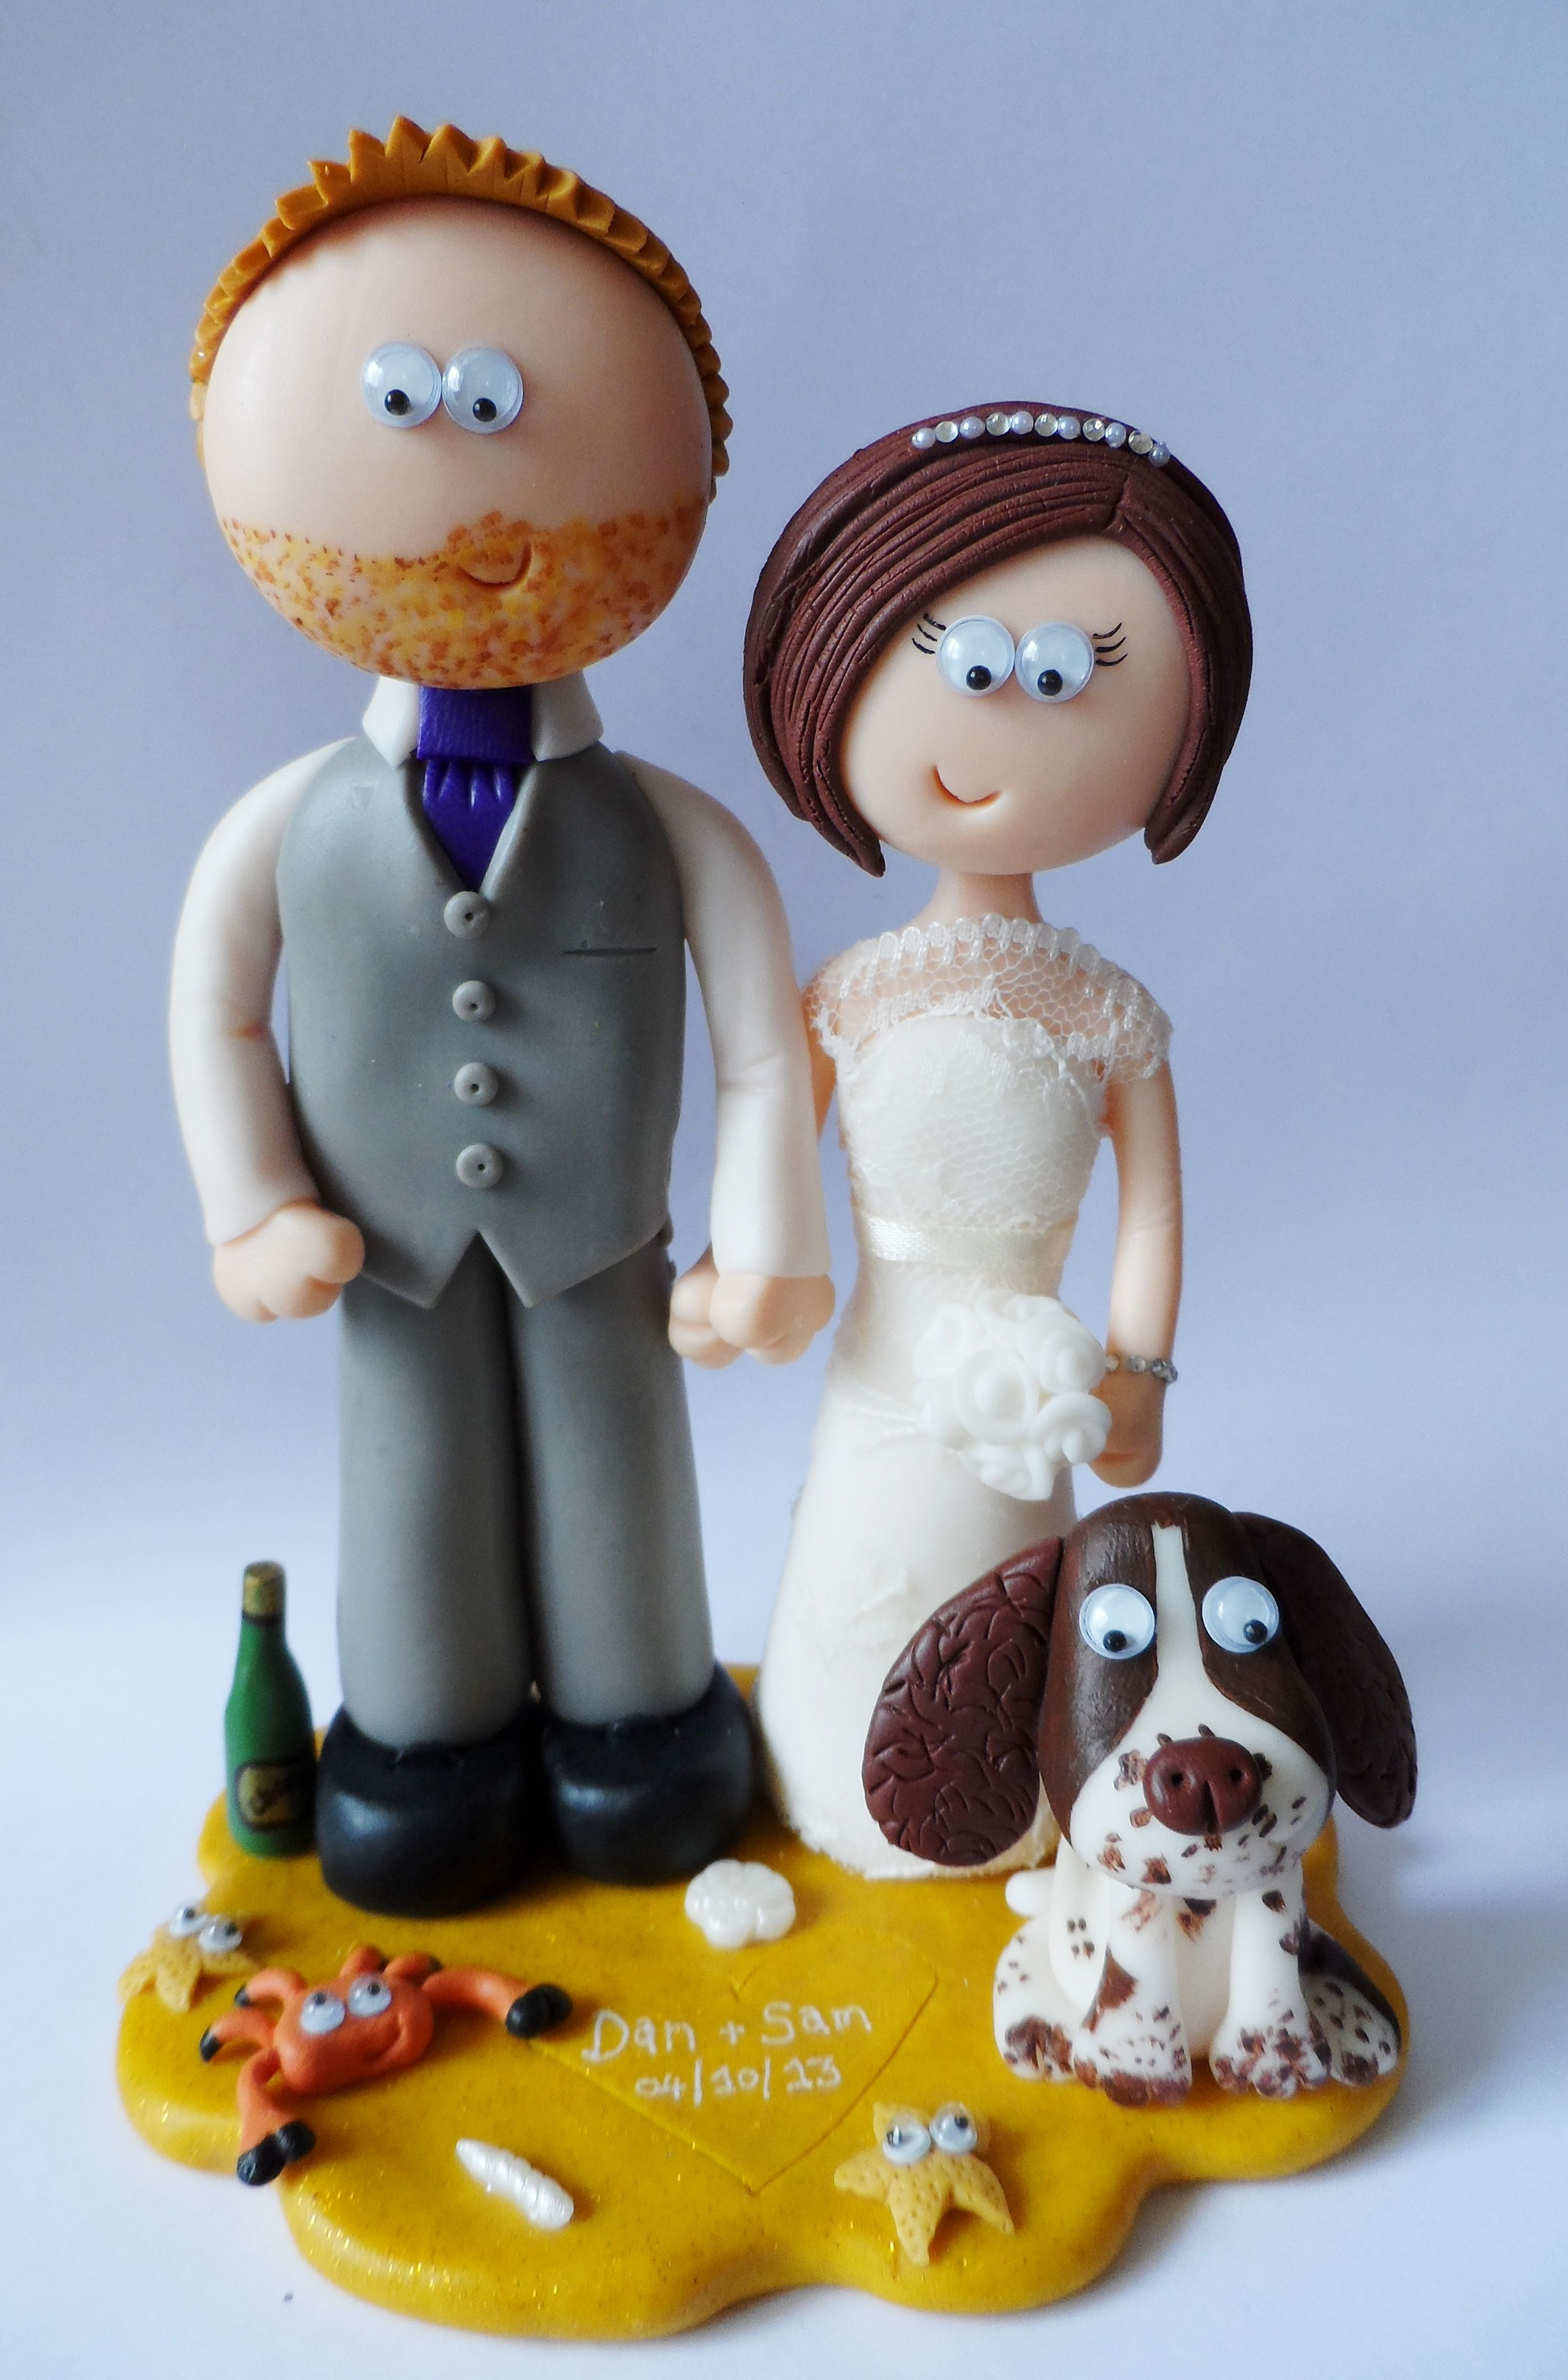 Beach Themed Personalised Bride Groom Wedding Cake Topper